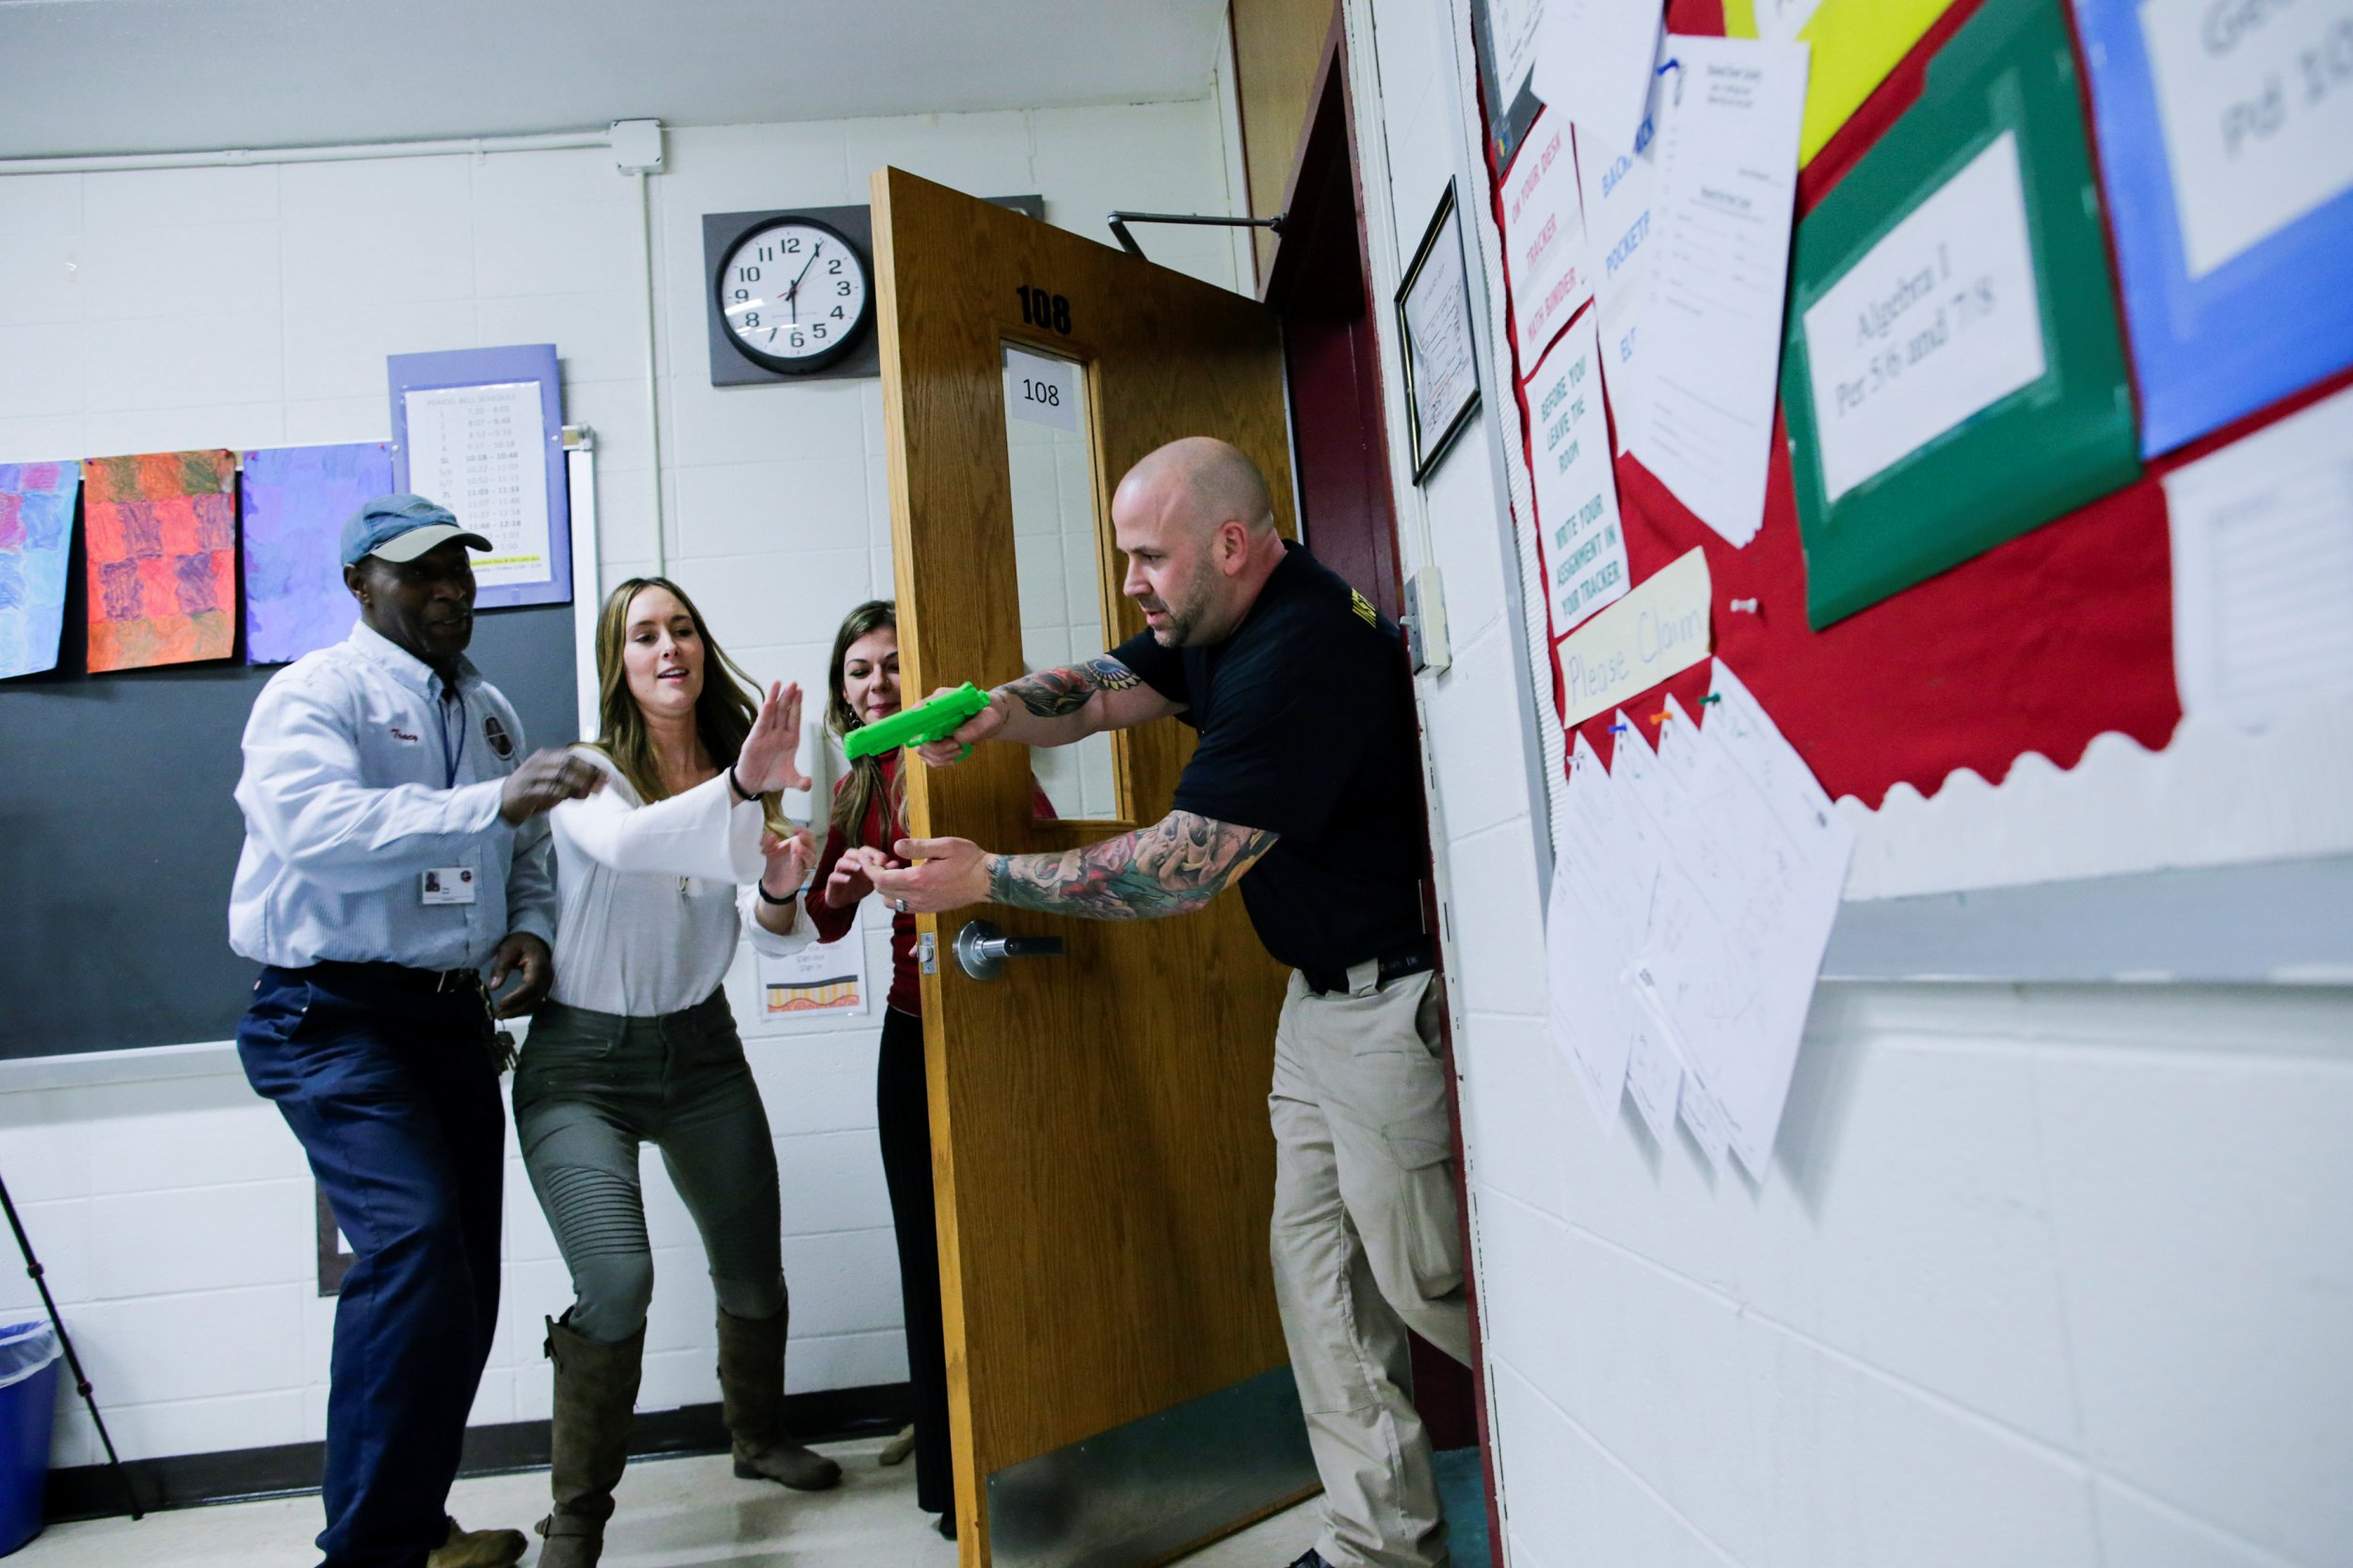 School Shooter Training